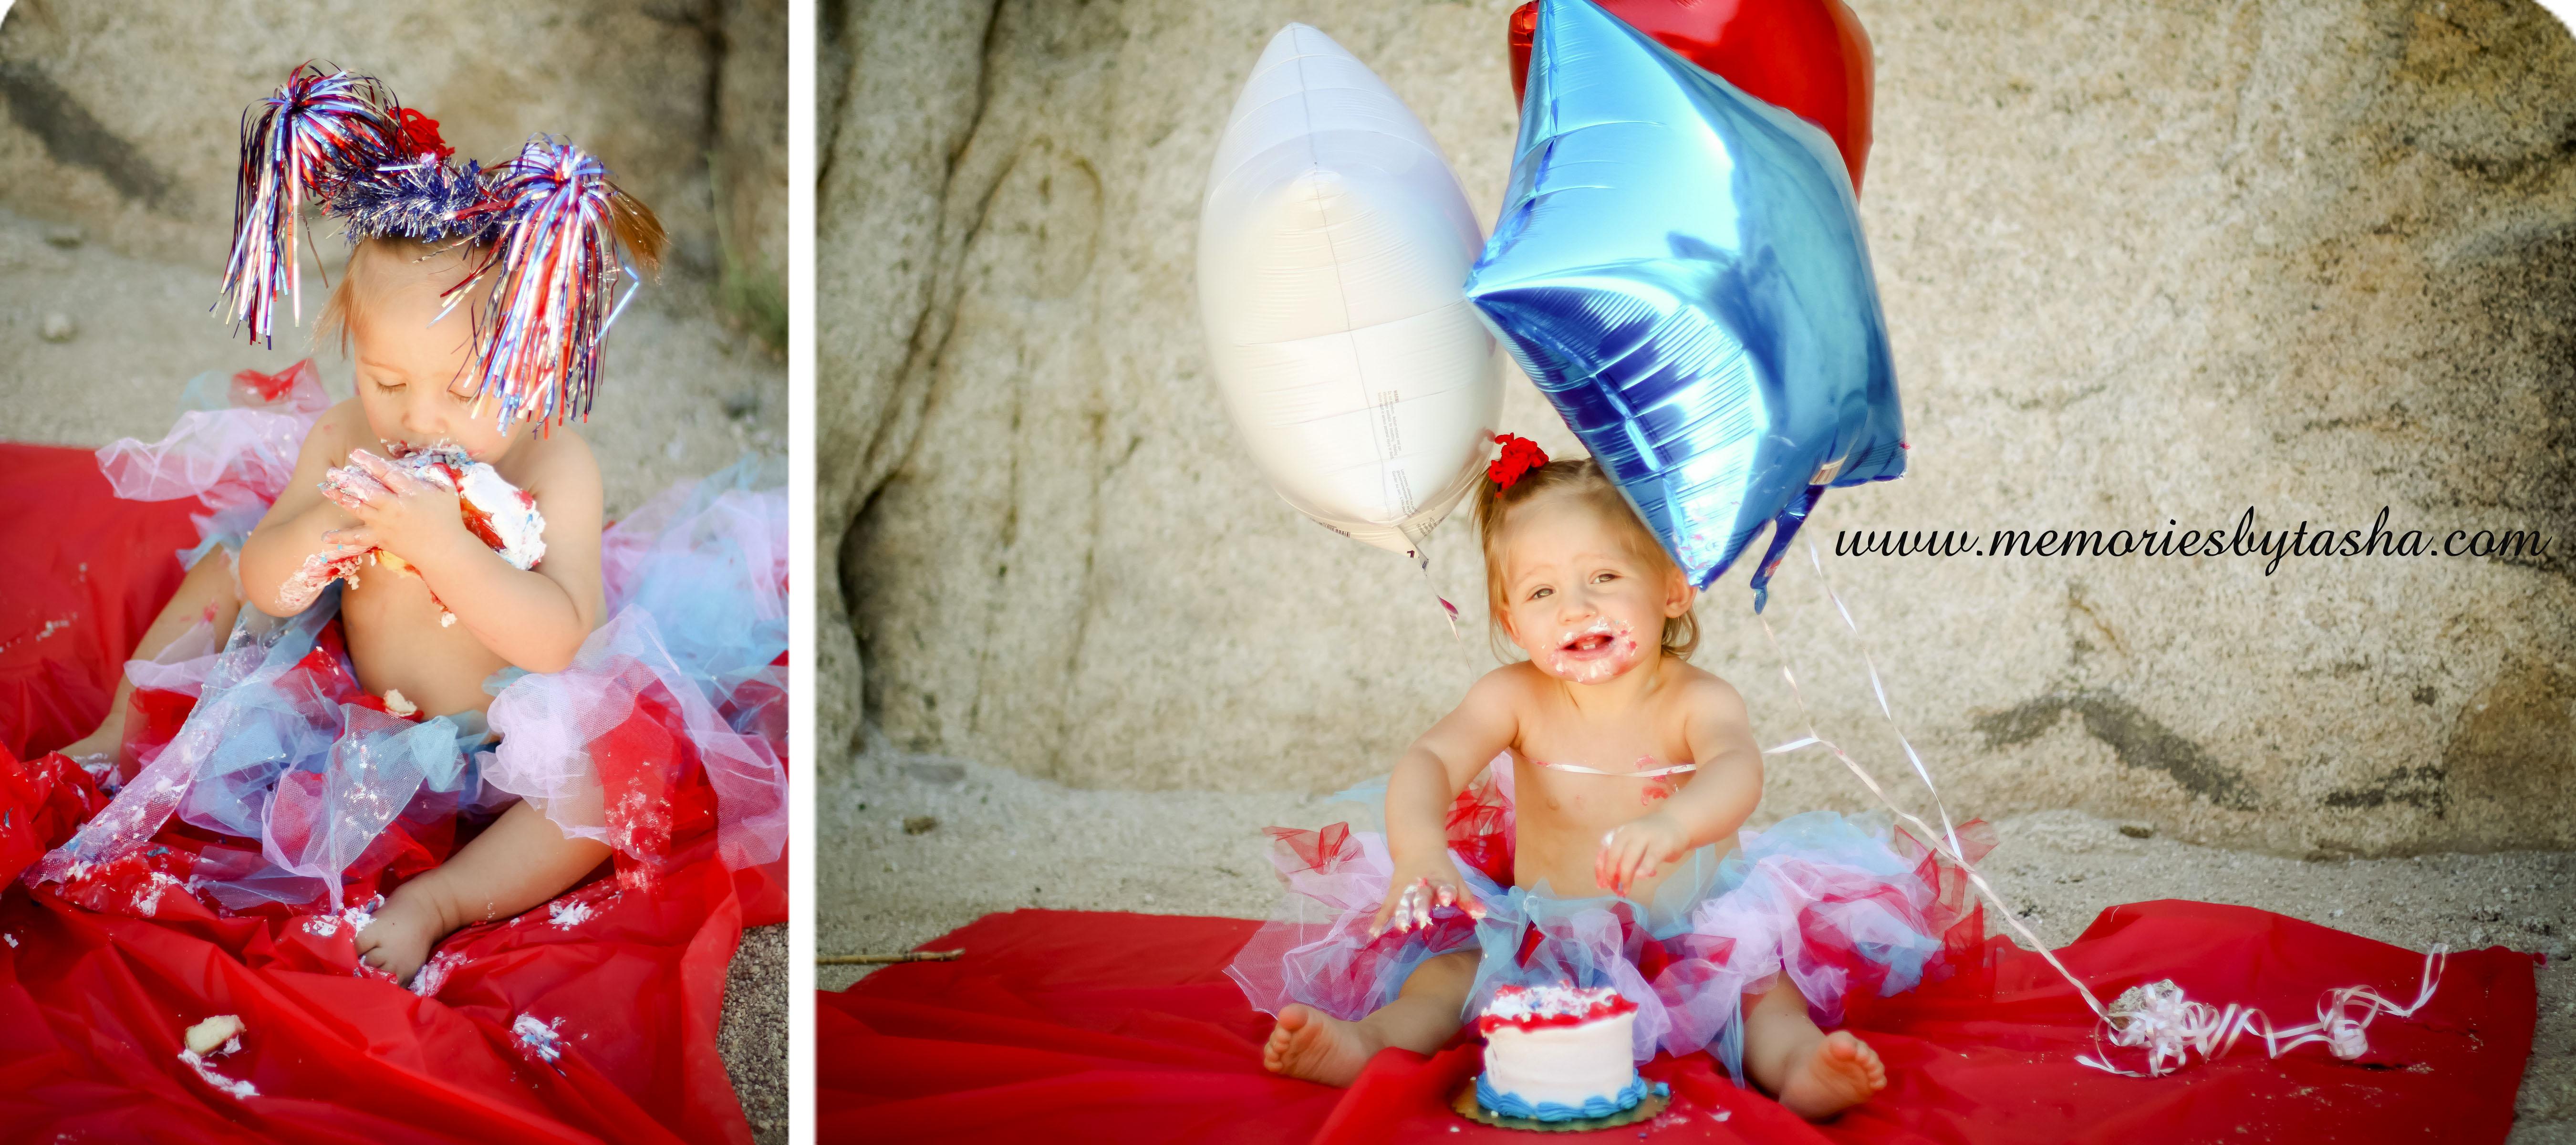 Twentynine Palms Photographer - Couples Photography - Family Photography - Children's Photography - Cake Smash-04